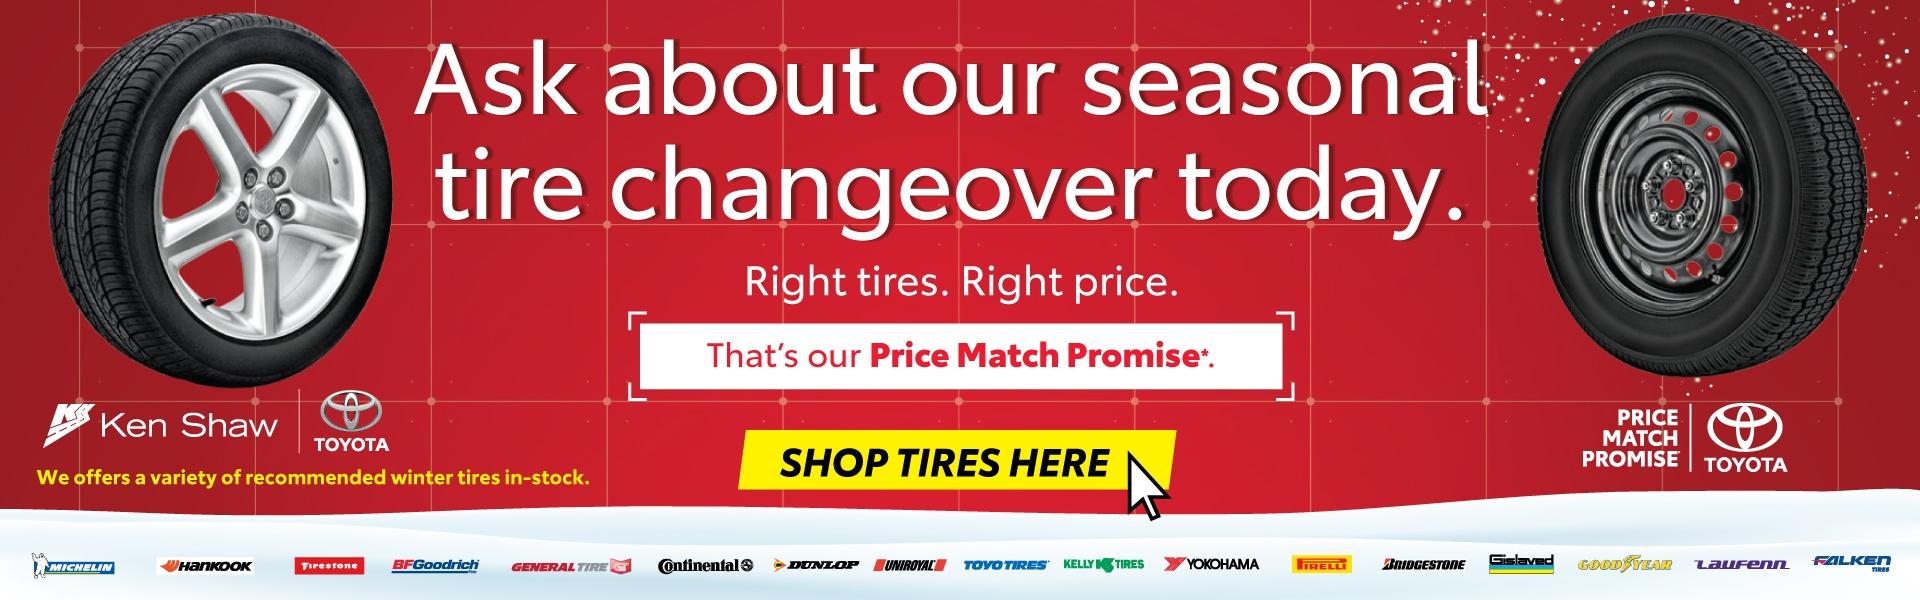 toyota tires price match promise in toronto ontario GTA winter tires sales